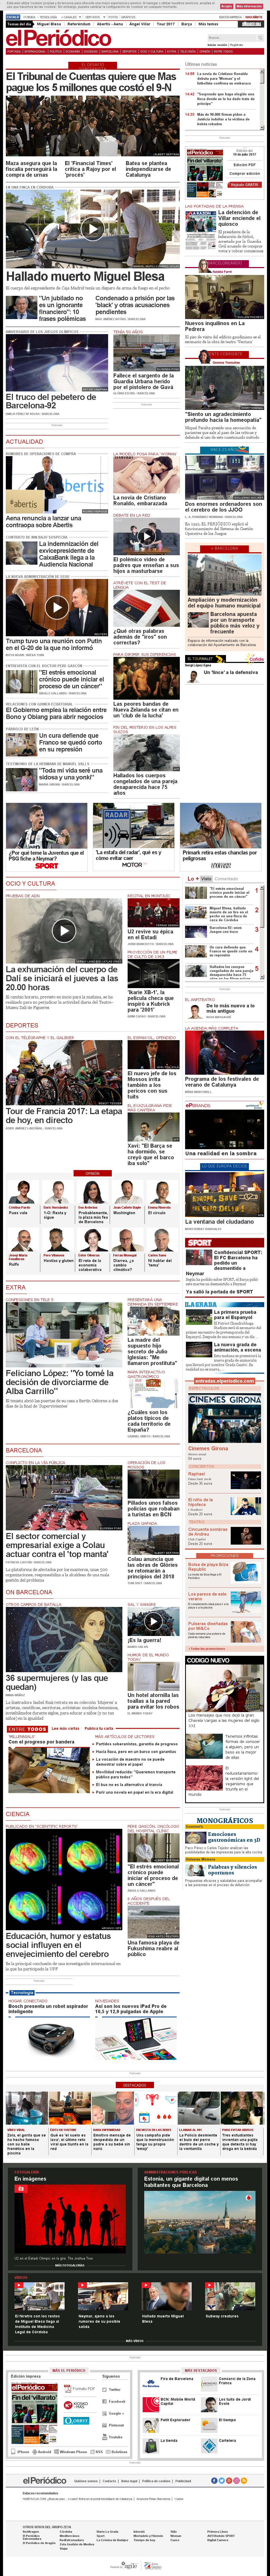 El Periodico at Wednesday July 19, 2017, 1:17 p.m. UTC